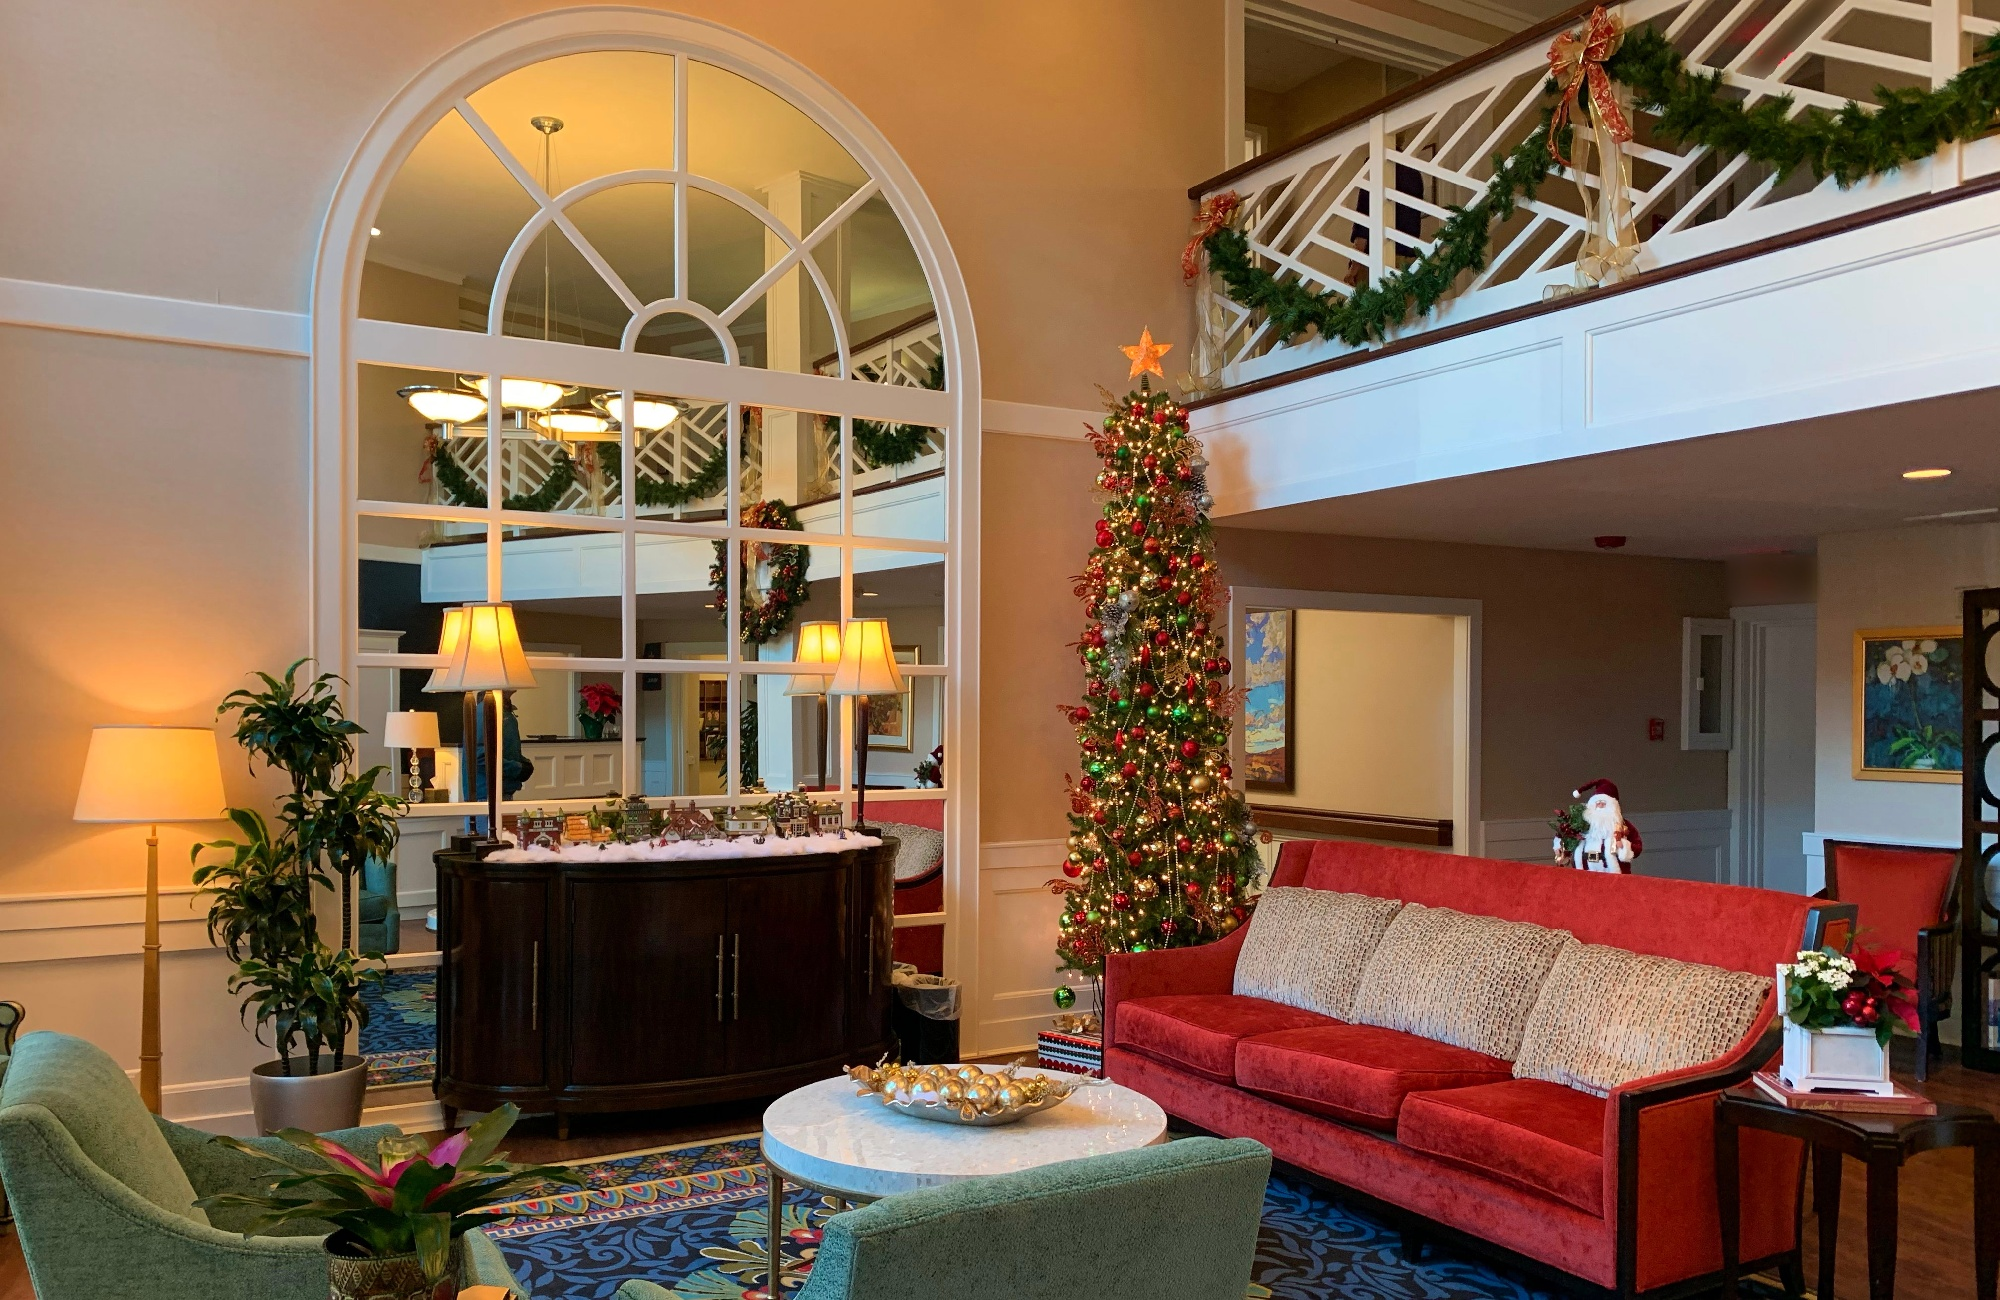 Reflecting on the Holidays at Deupree House